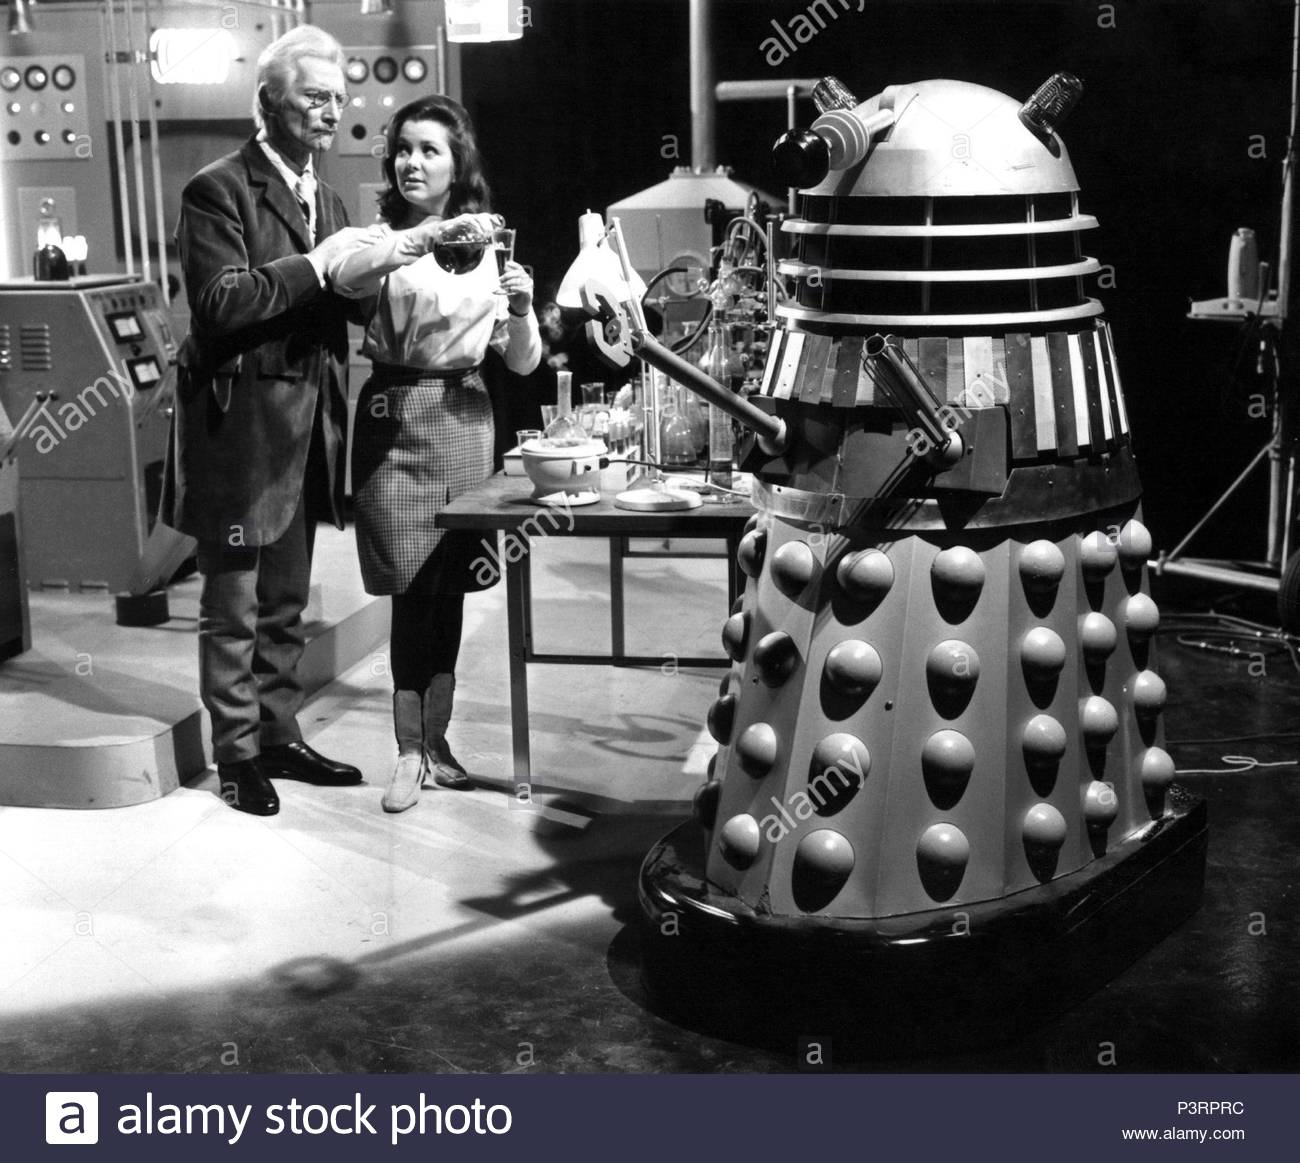 original-film-title-daleks-invasion-earth-2150-a-d-english-title-daleks-invade-earth-2150-a-d-film-director-gordon-flemyng-year-1966-stars-peter-cushing-credit-british-lion-album-P3RPRC.jpg